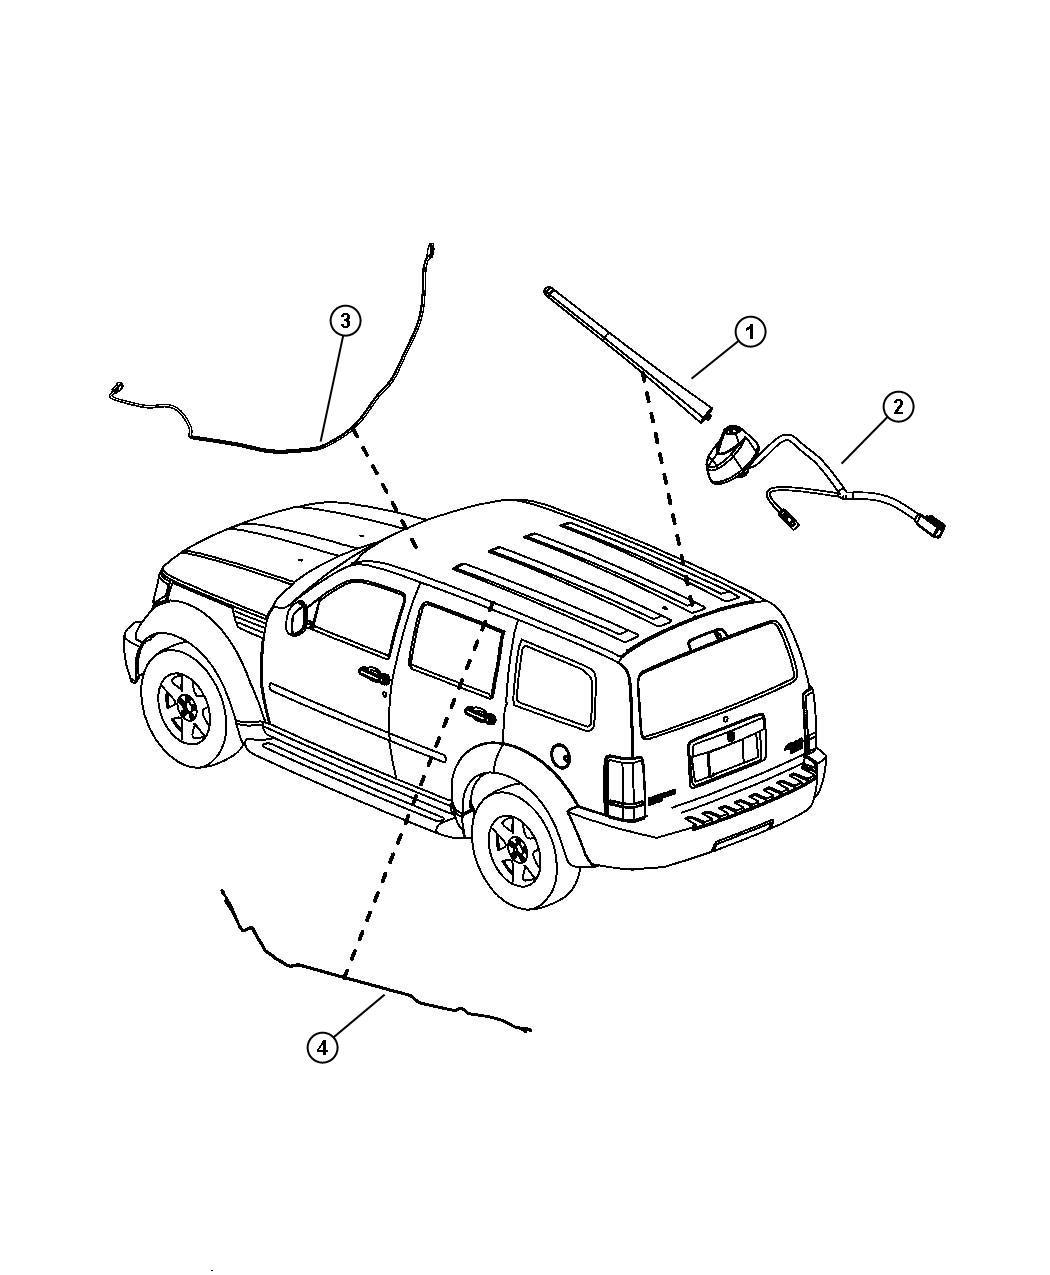 2008 Dodge Avenger Mast. Antenna. [rdb]. Radio, speakers